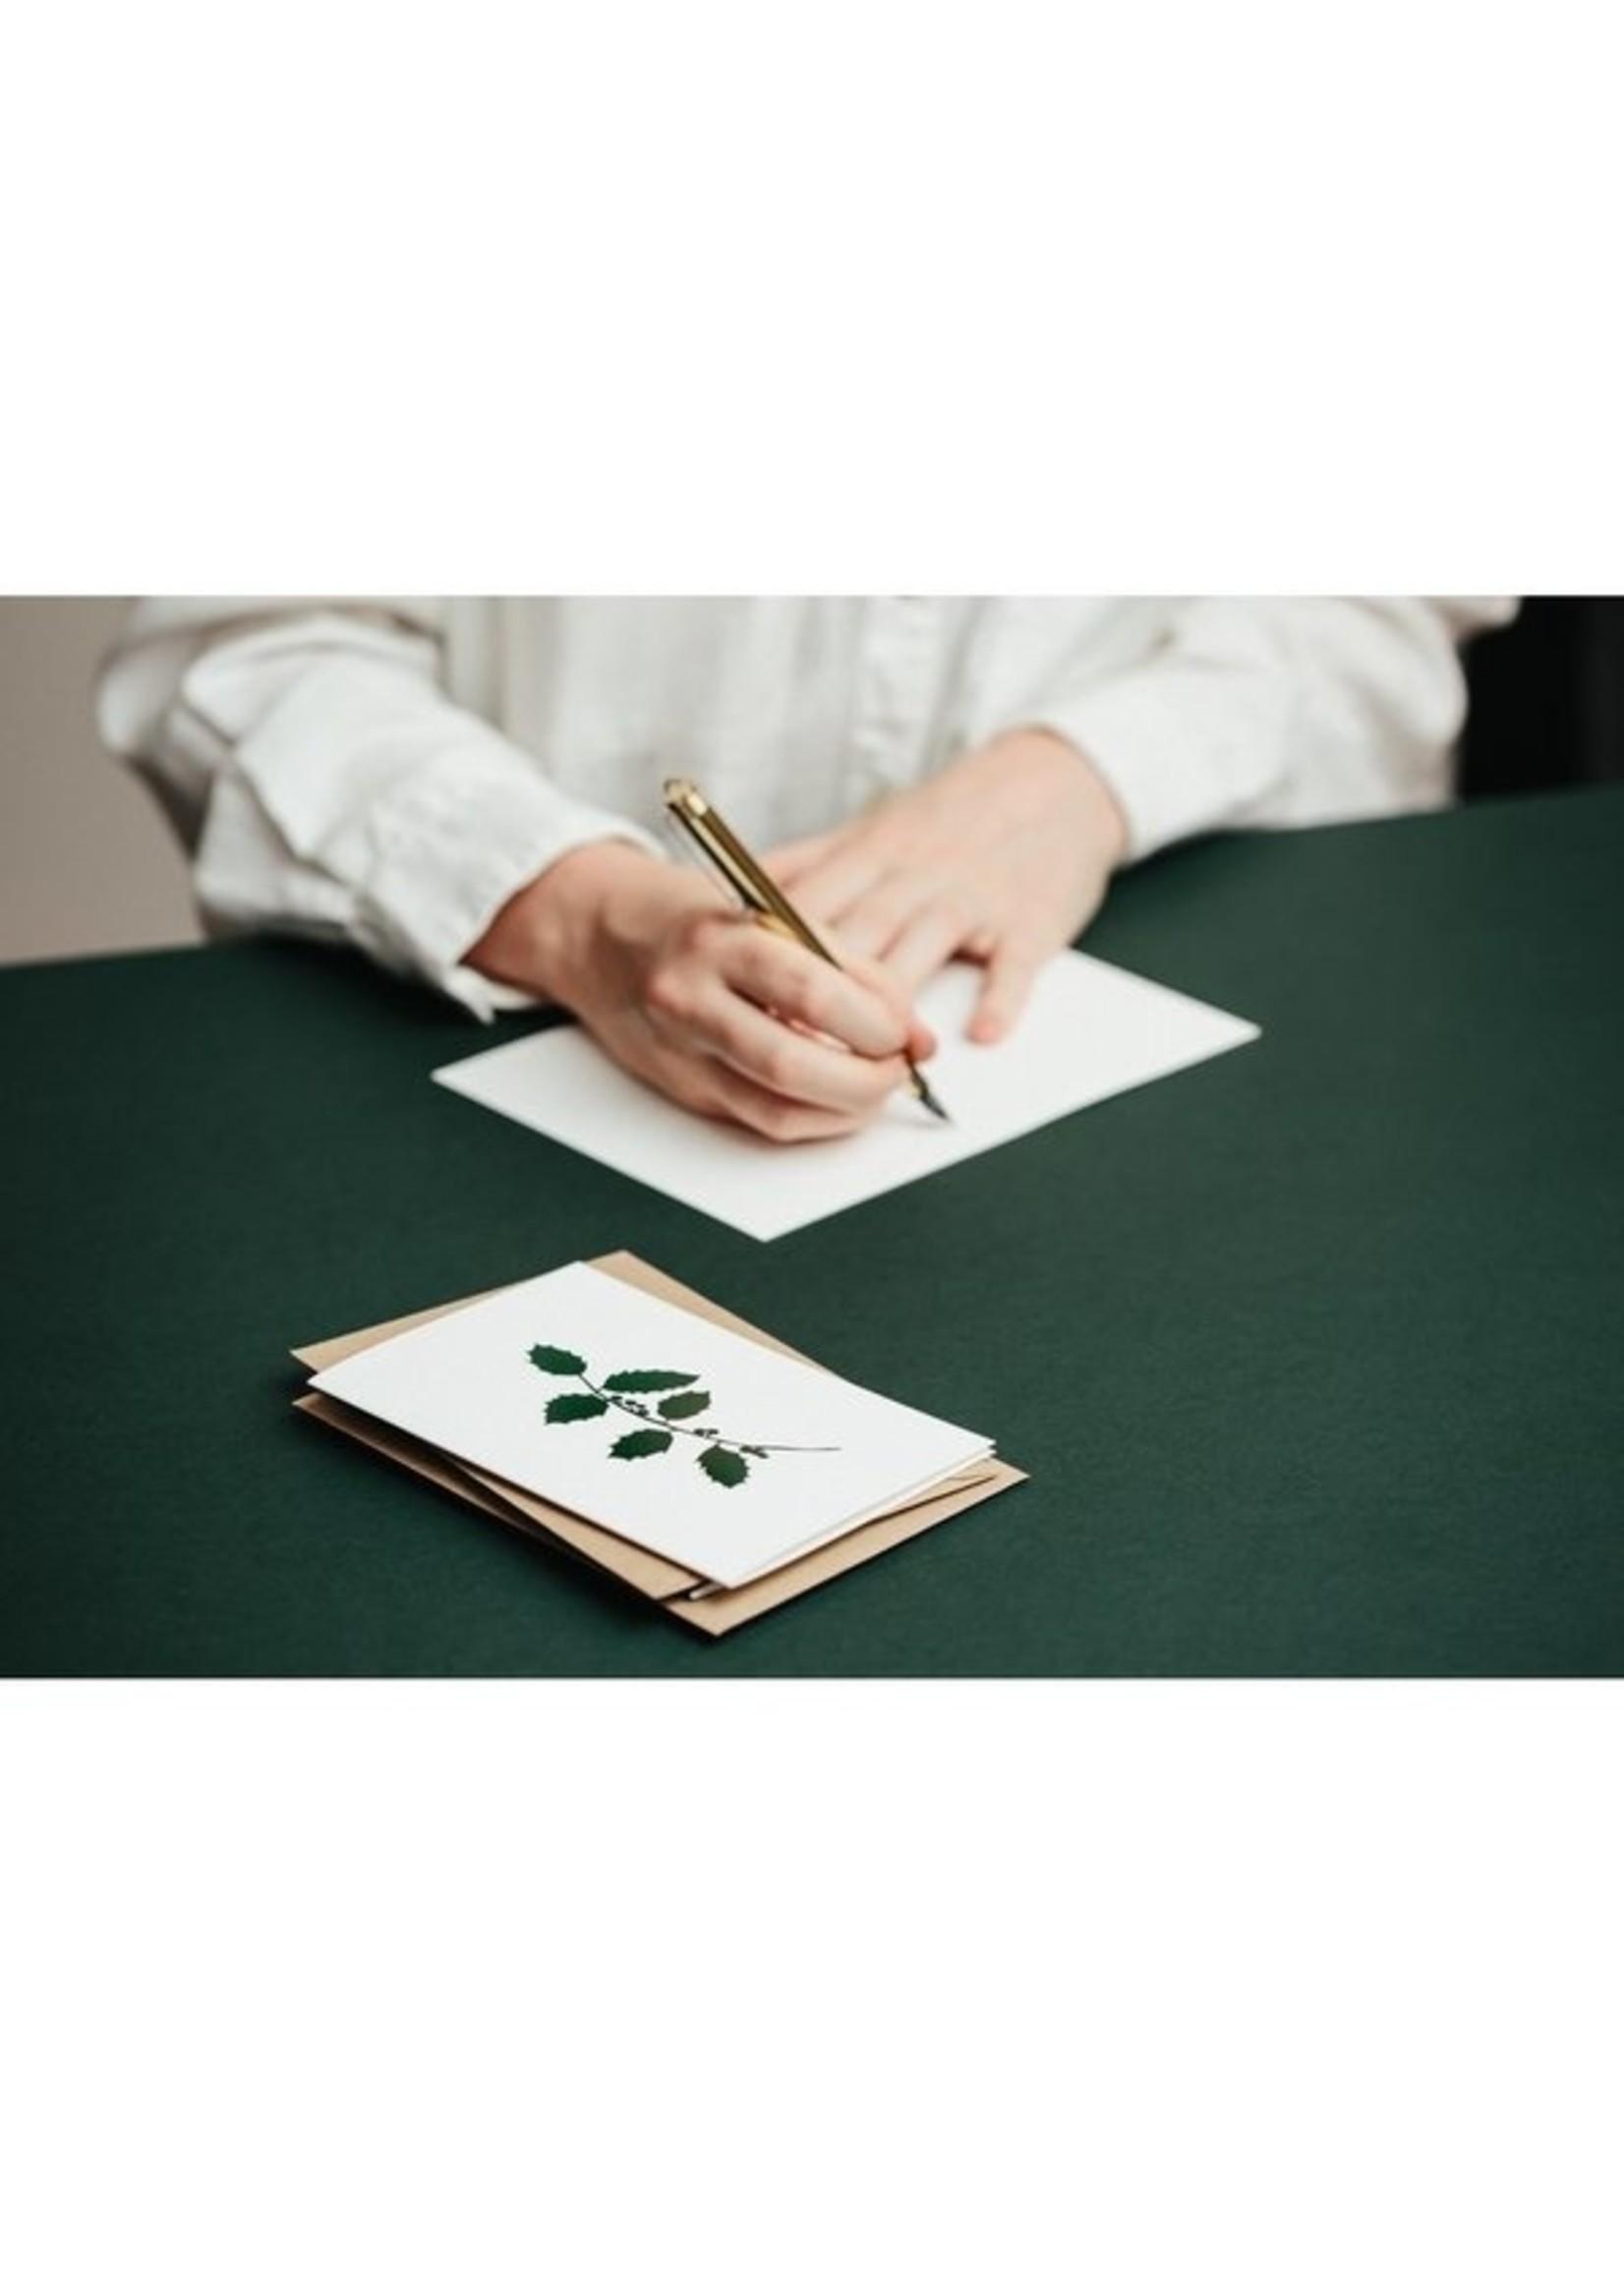 Ola Ola Foil Blocked Card, Mistletoe Print in Ivory/Green